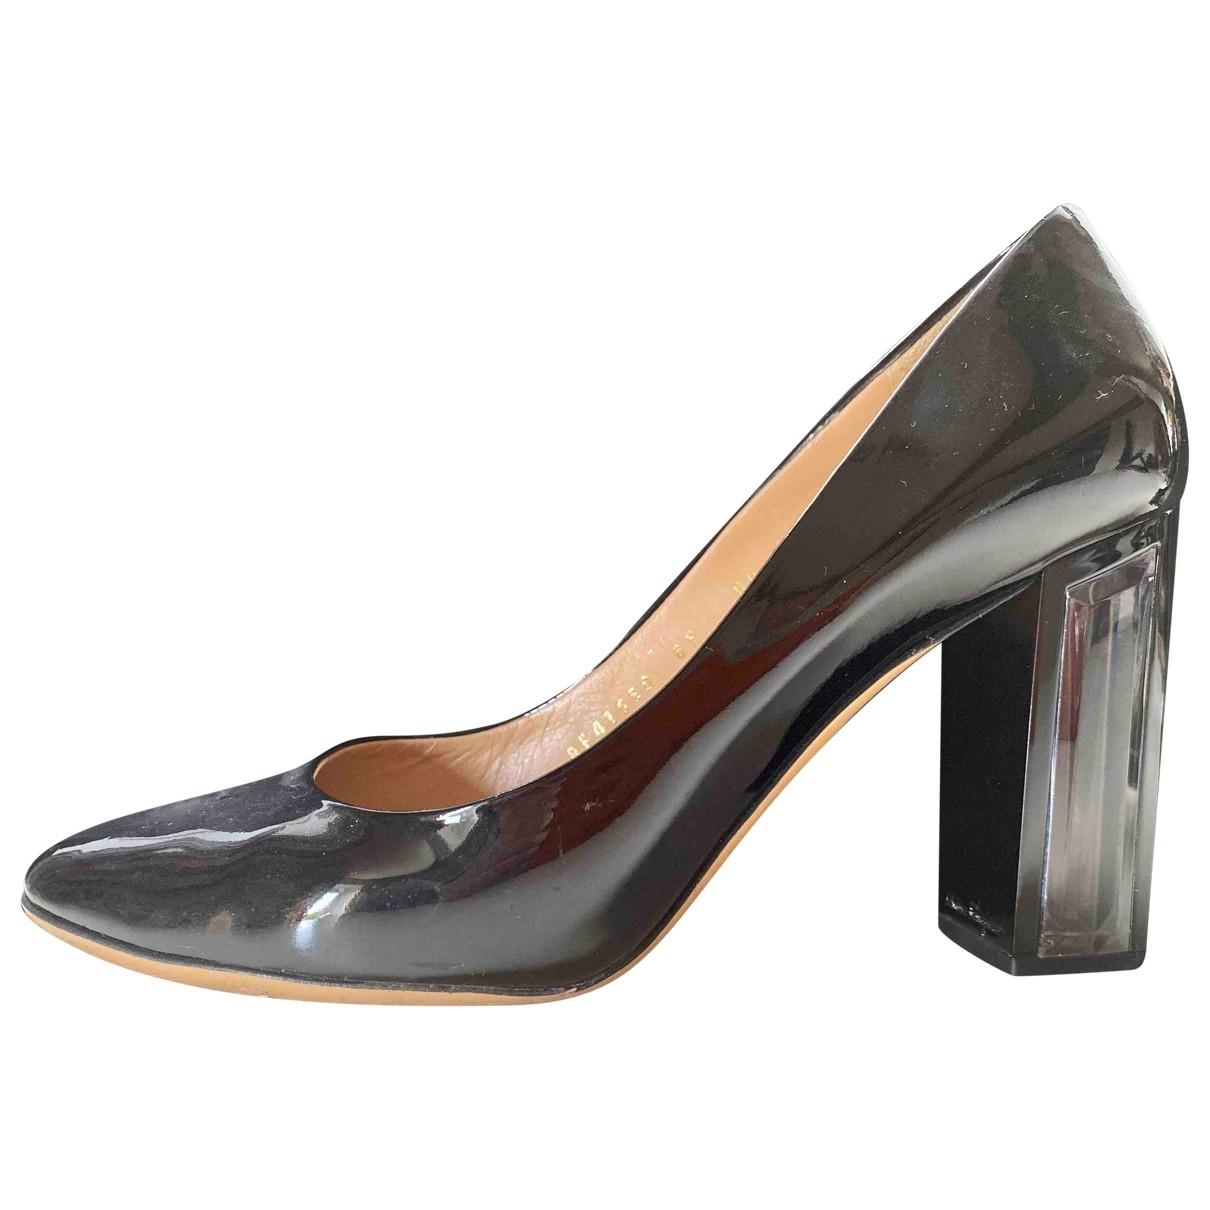 Salvatore Ferragamo \N Black Patent leather Heels for Women 8.5 US